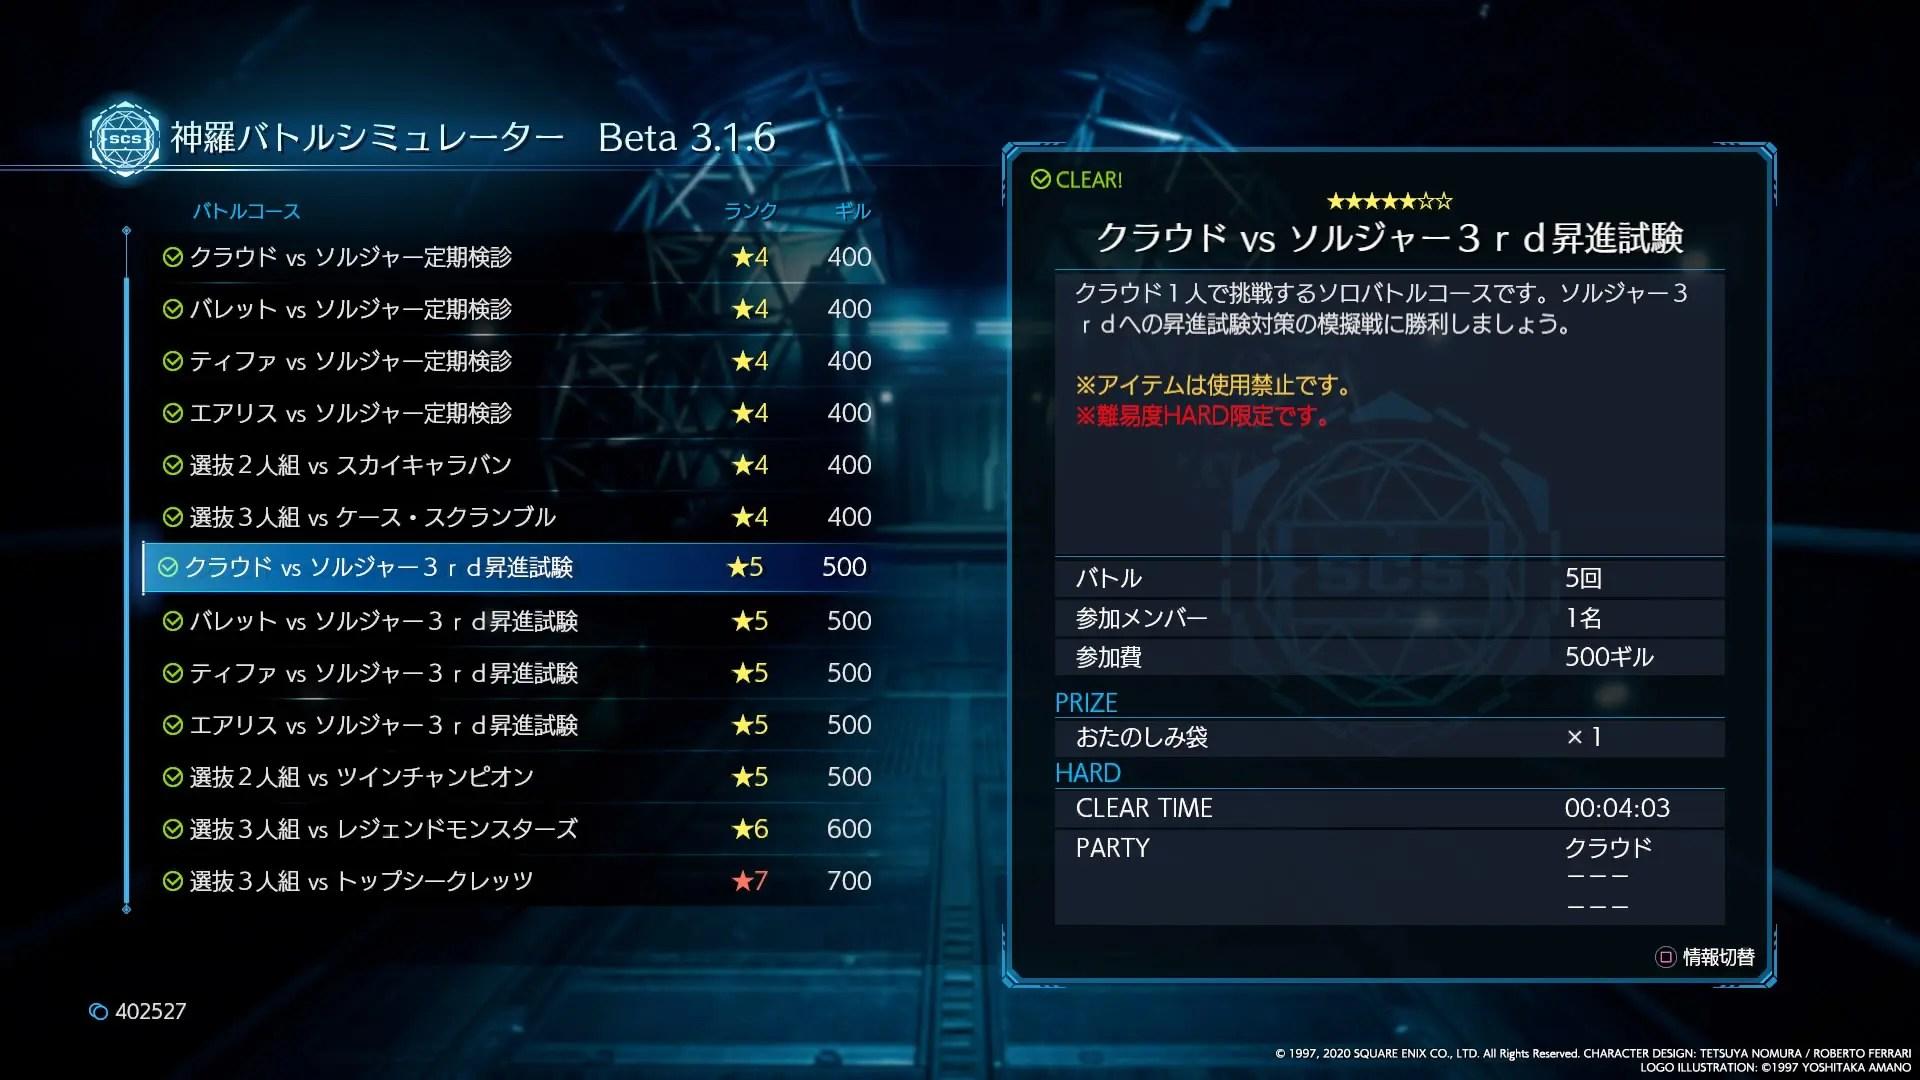 【FF7R】ソルジャー3rd昇進試験~攻略【バトルシュミレーター】